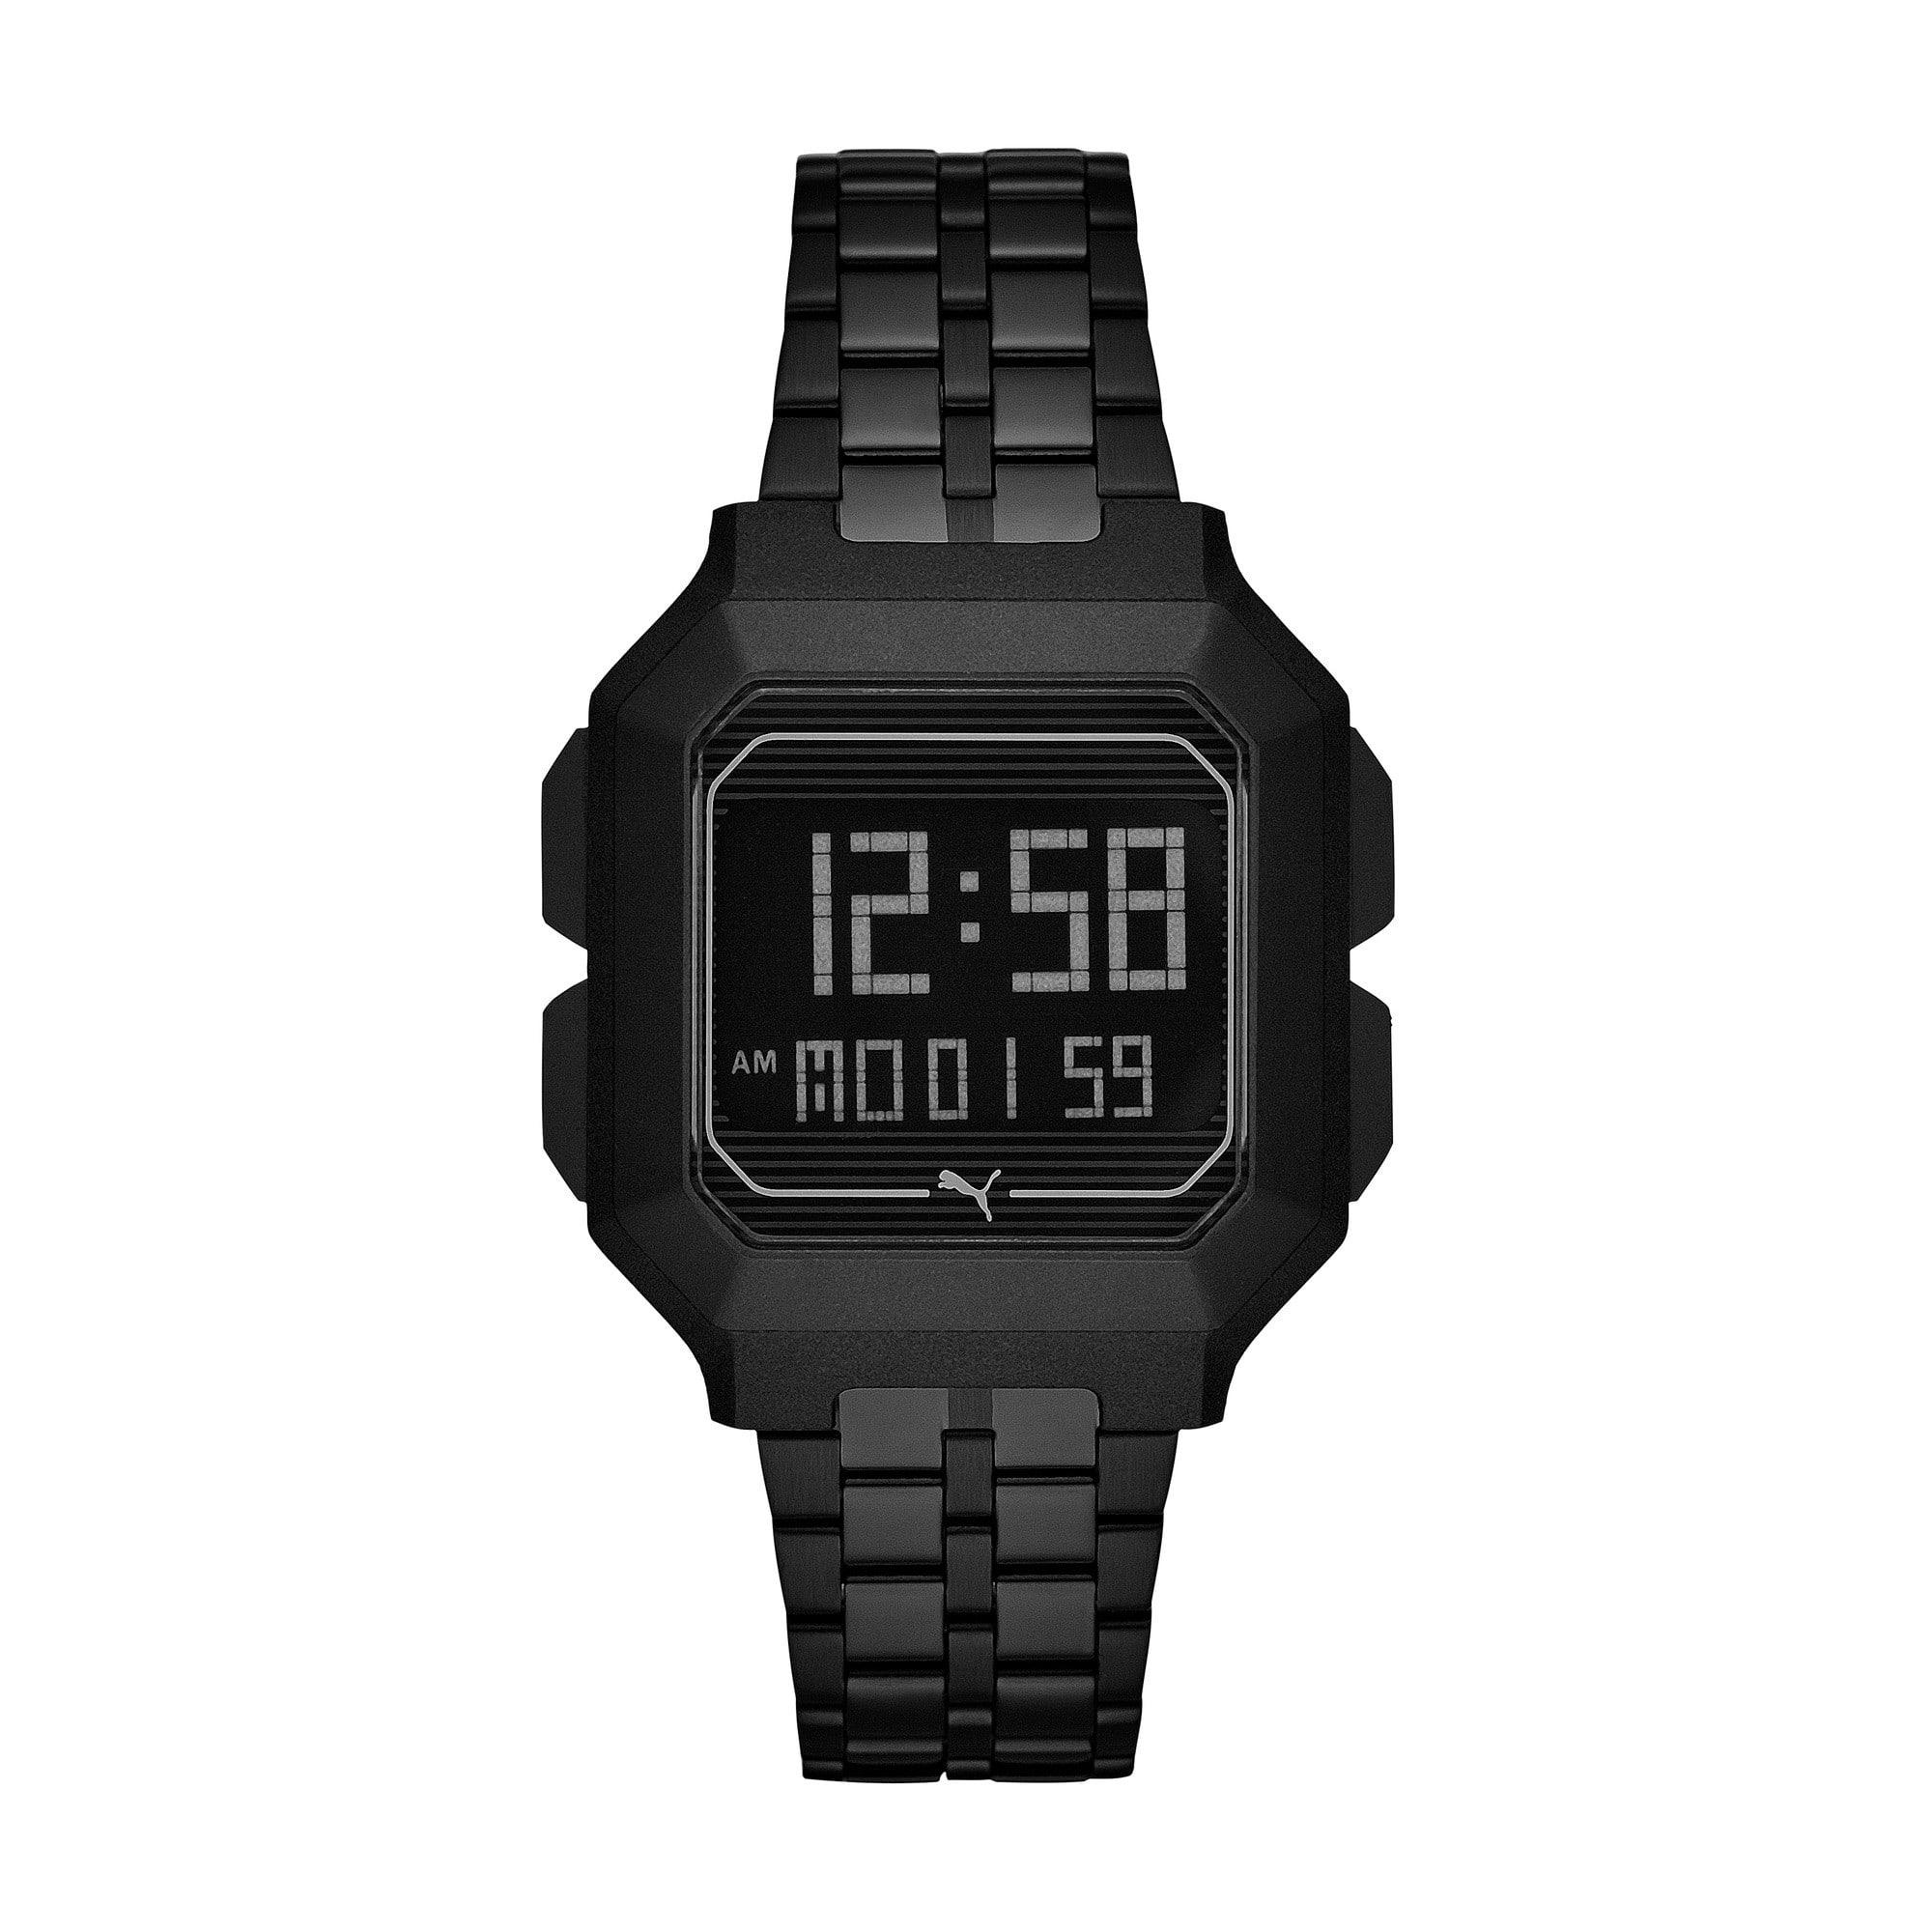 Thumbnail 1 of Remix Black Stainless Steel Digital Watch, Black/Black, medium